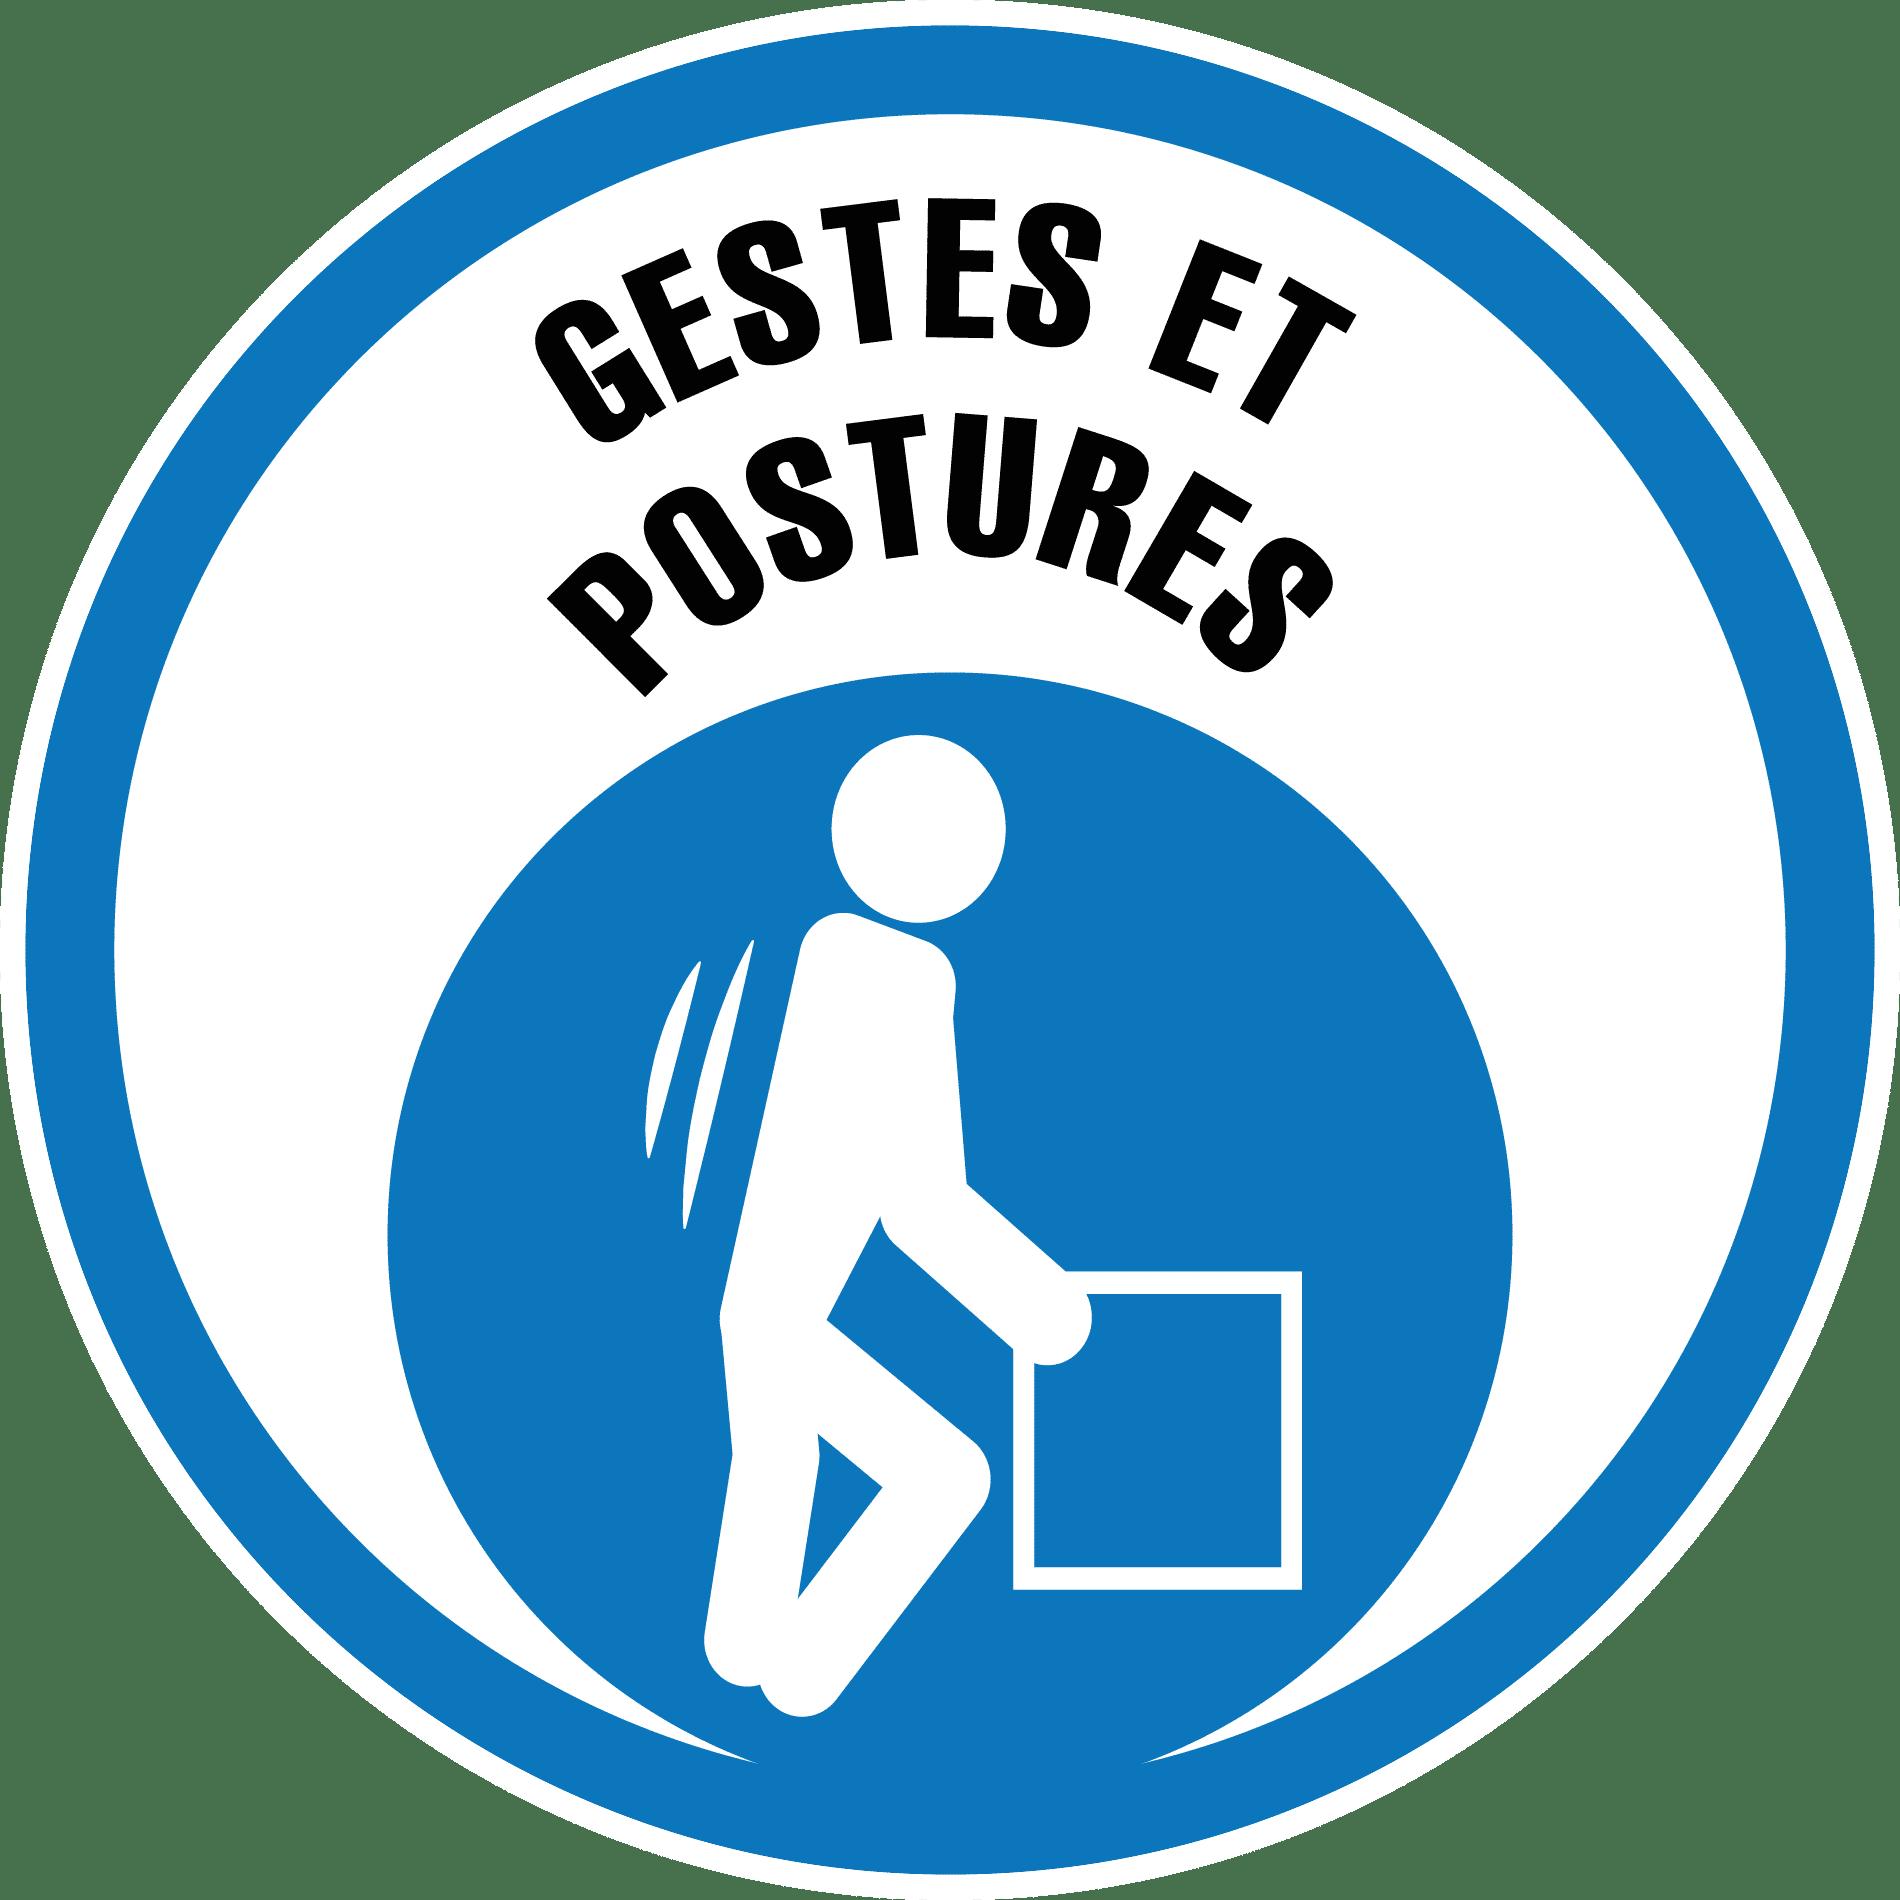 Gestes et postures manutention